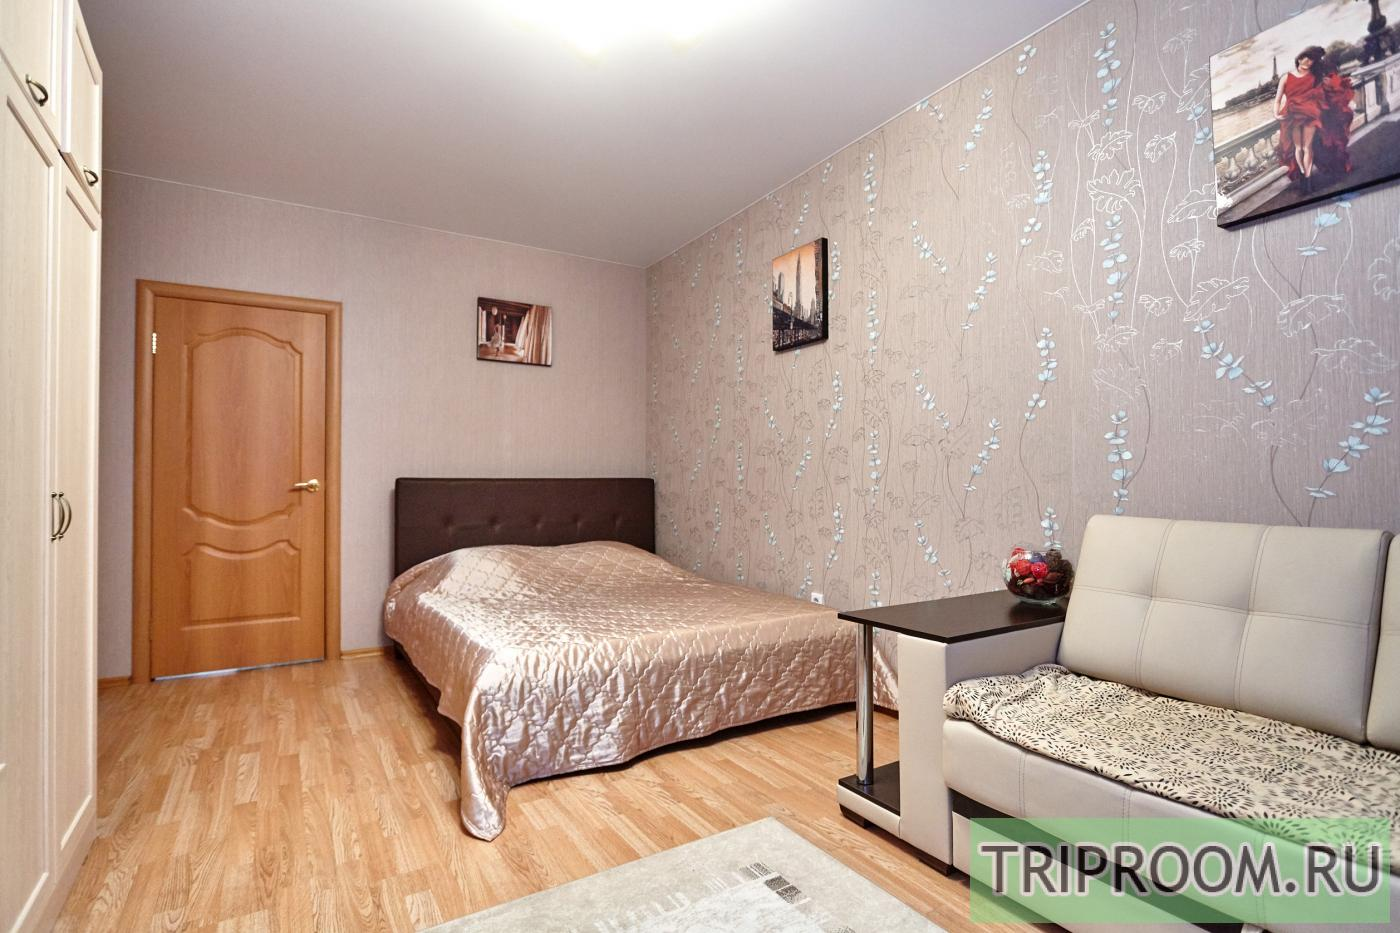 1-комнатная квартира посуточно (вариант № 6860), ул. Соколова улица, фото № 5